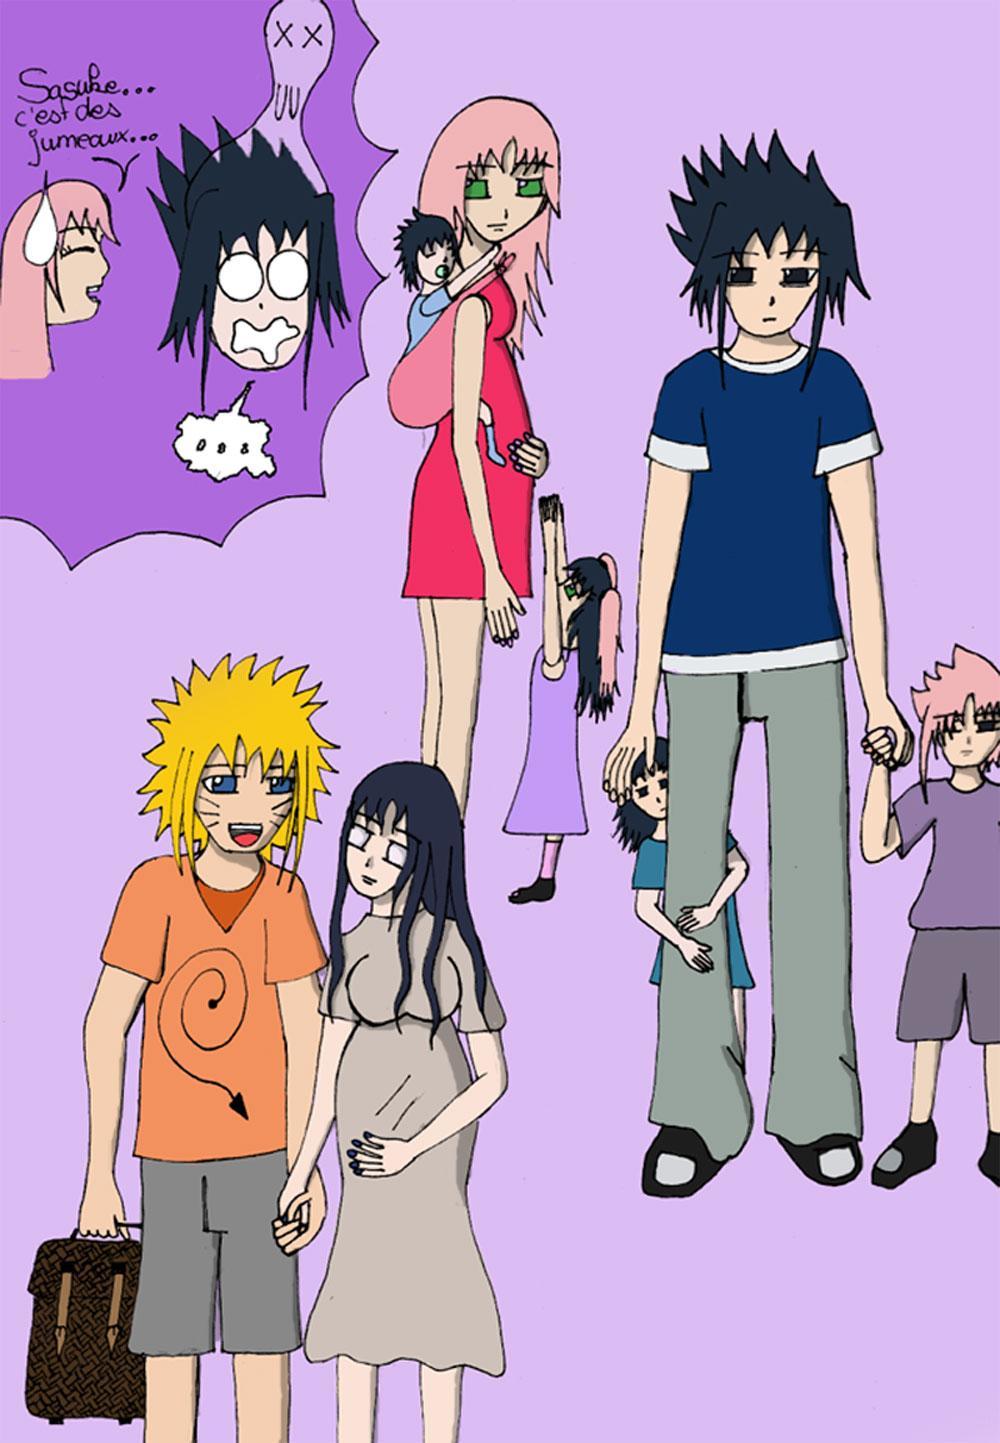 Sasuke Hinata Family | www.imgkid.com - The Image Kid Has It!